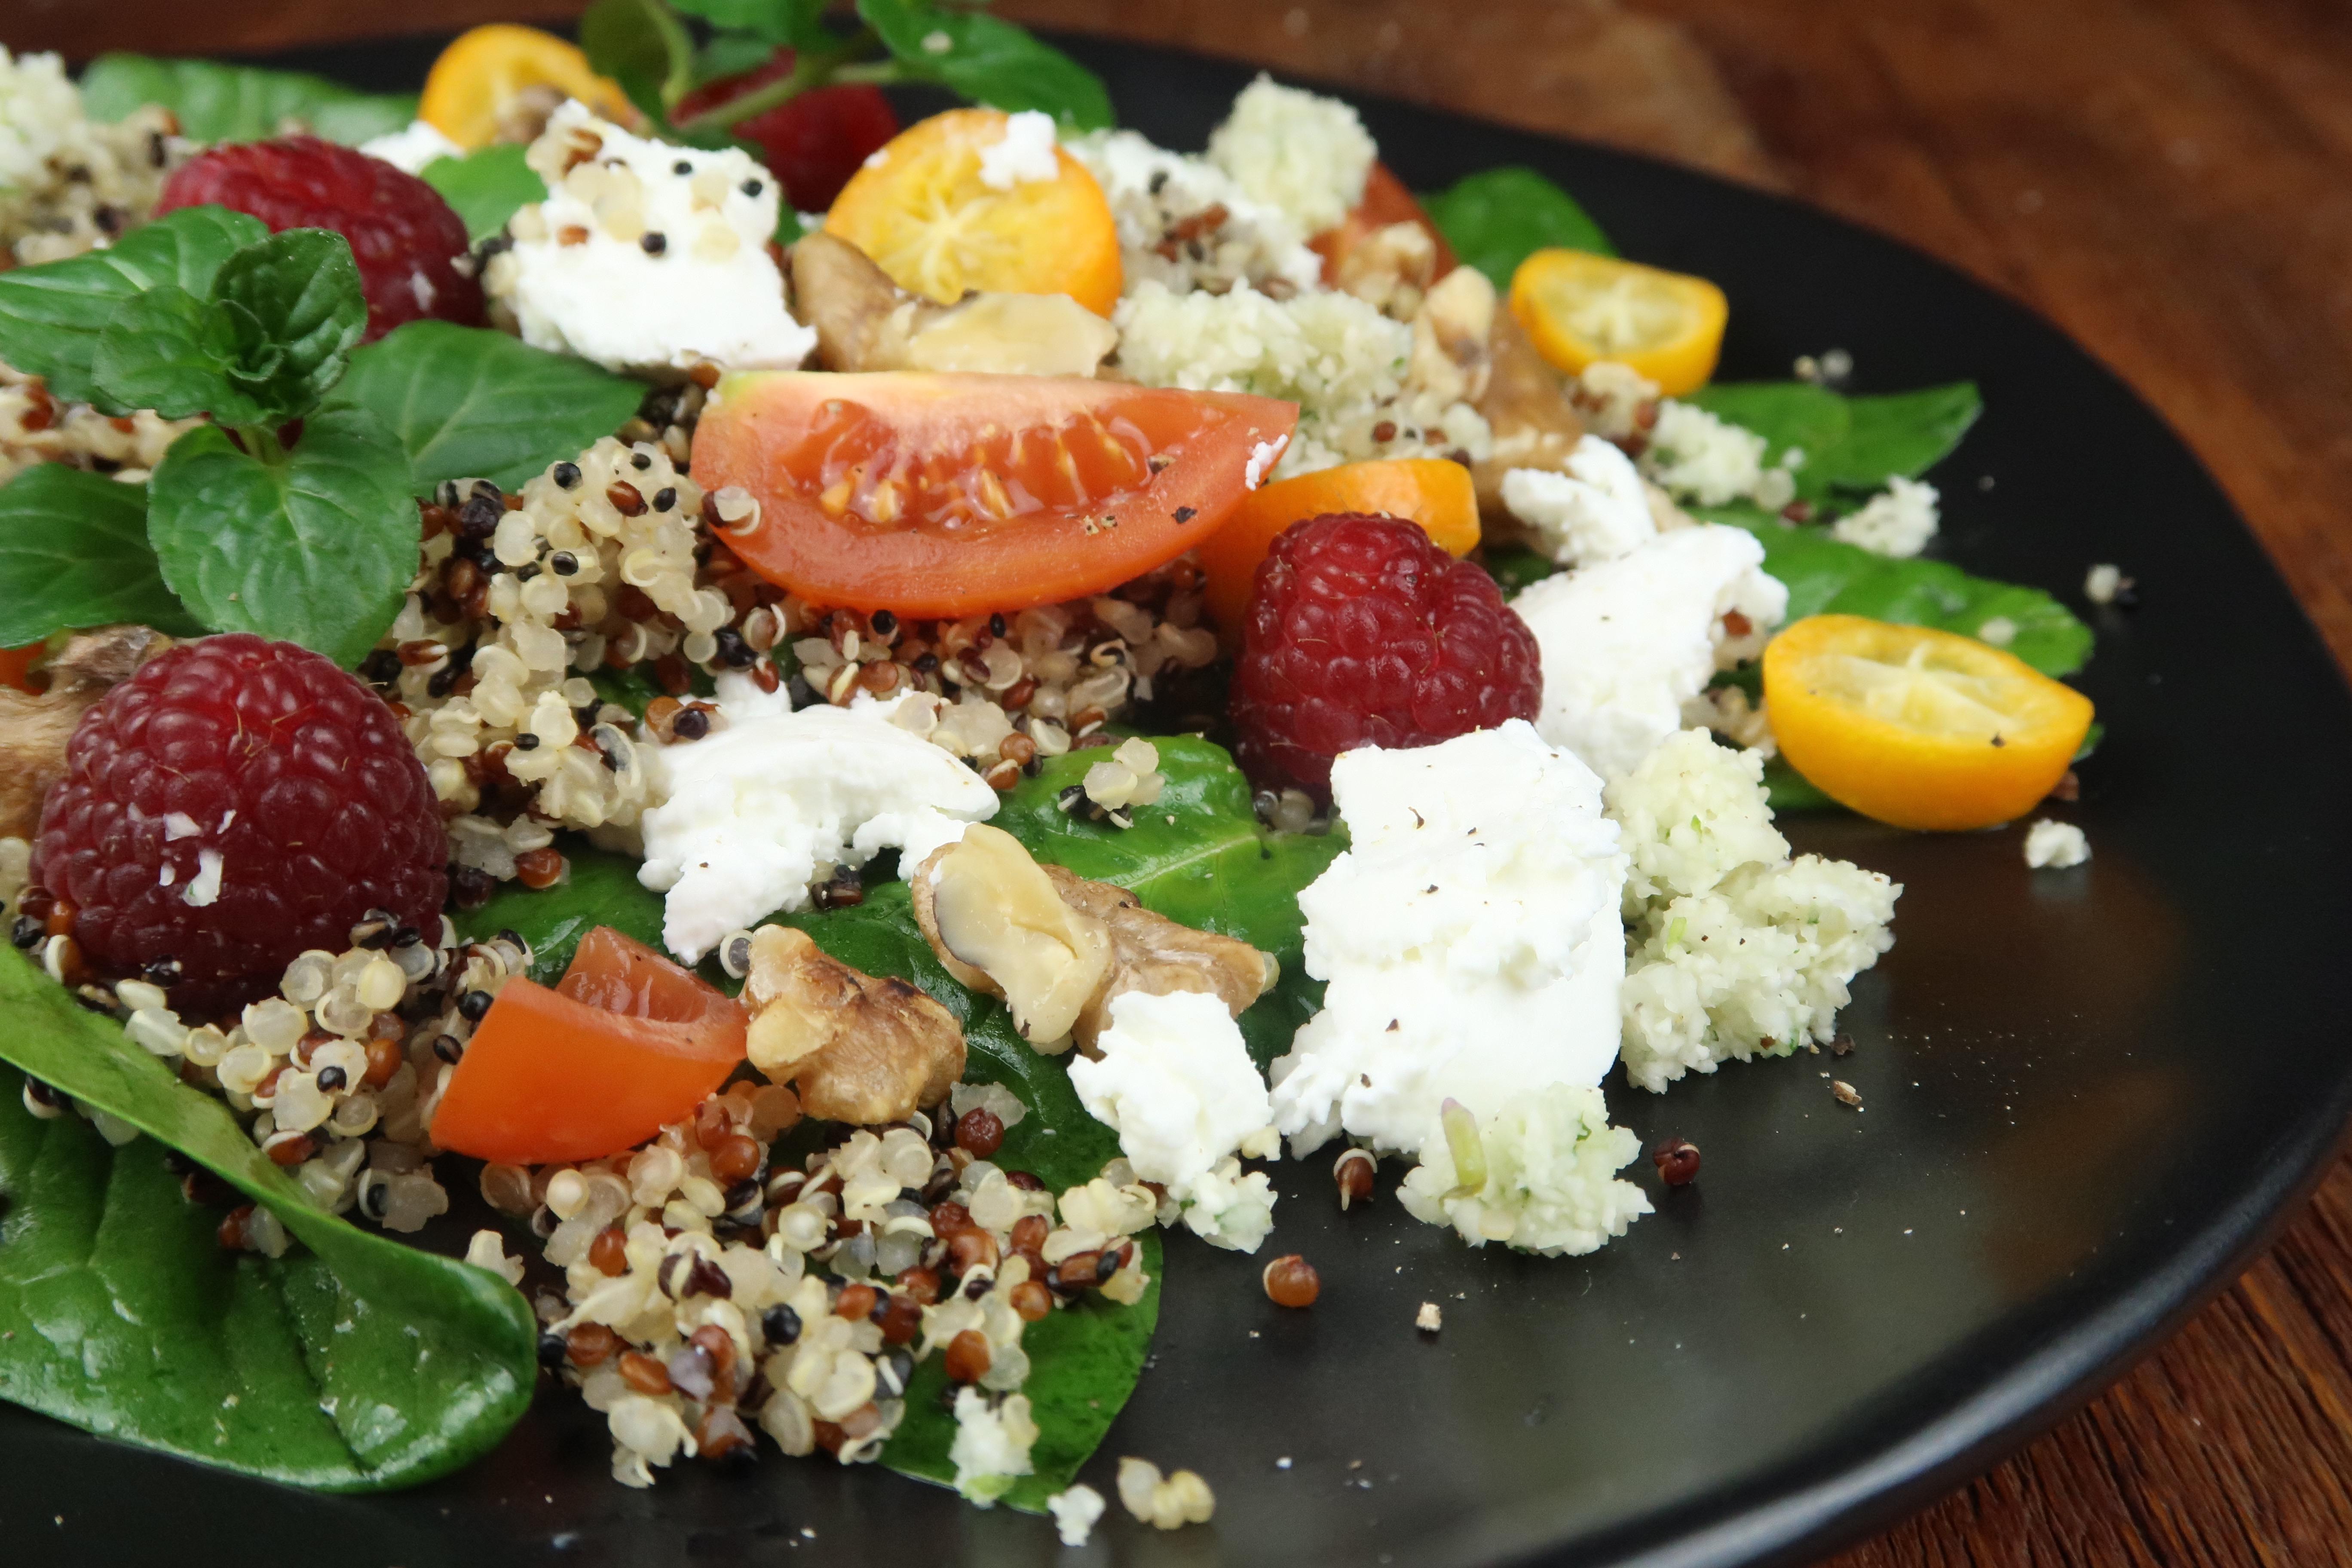 Wintersalat mit Quinoa, Blumenkohl-Tabouleh, Ziegenkäse, Spinat und Himbeeren